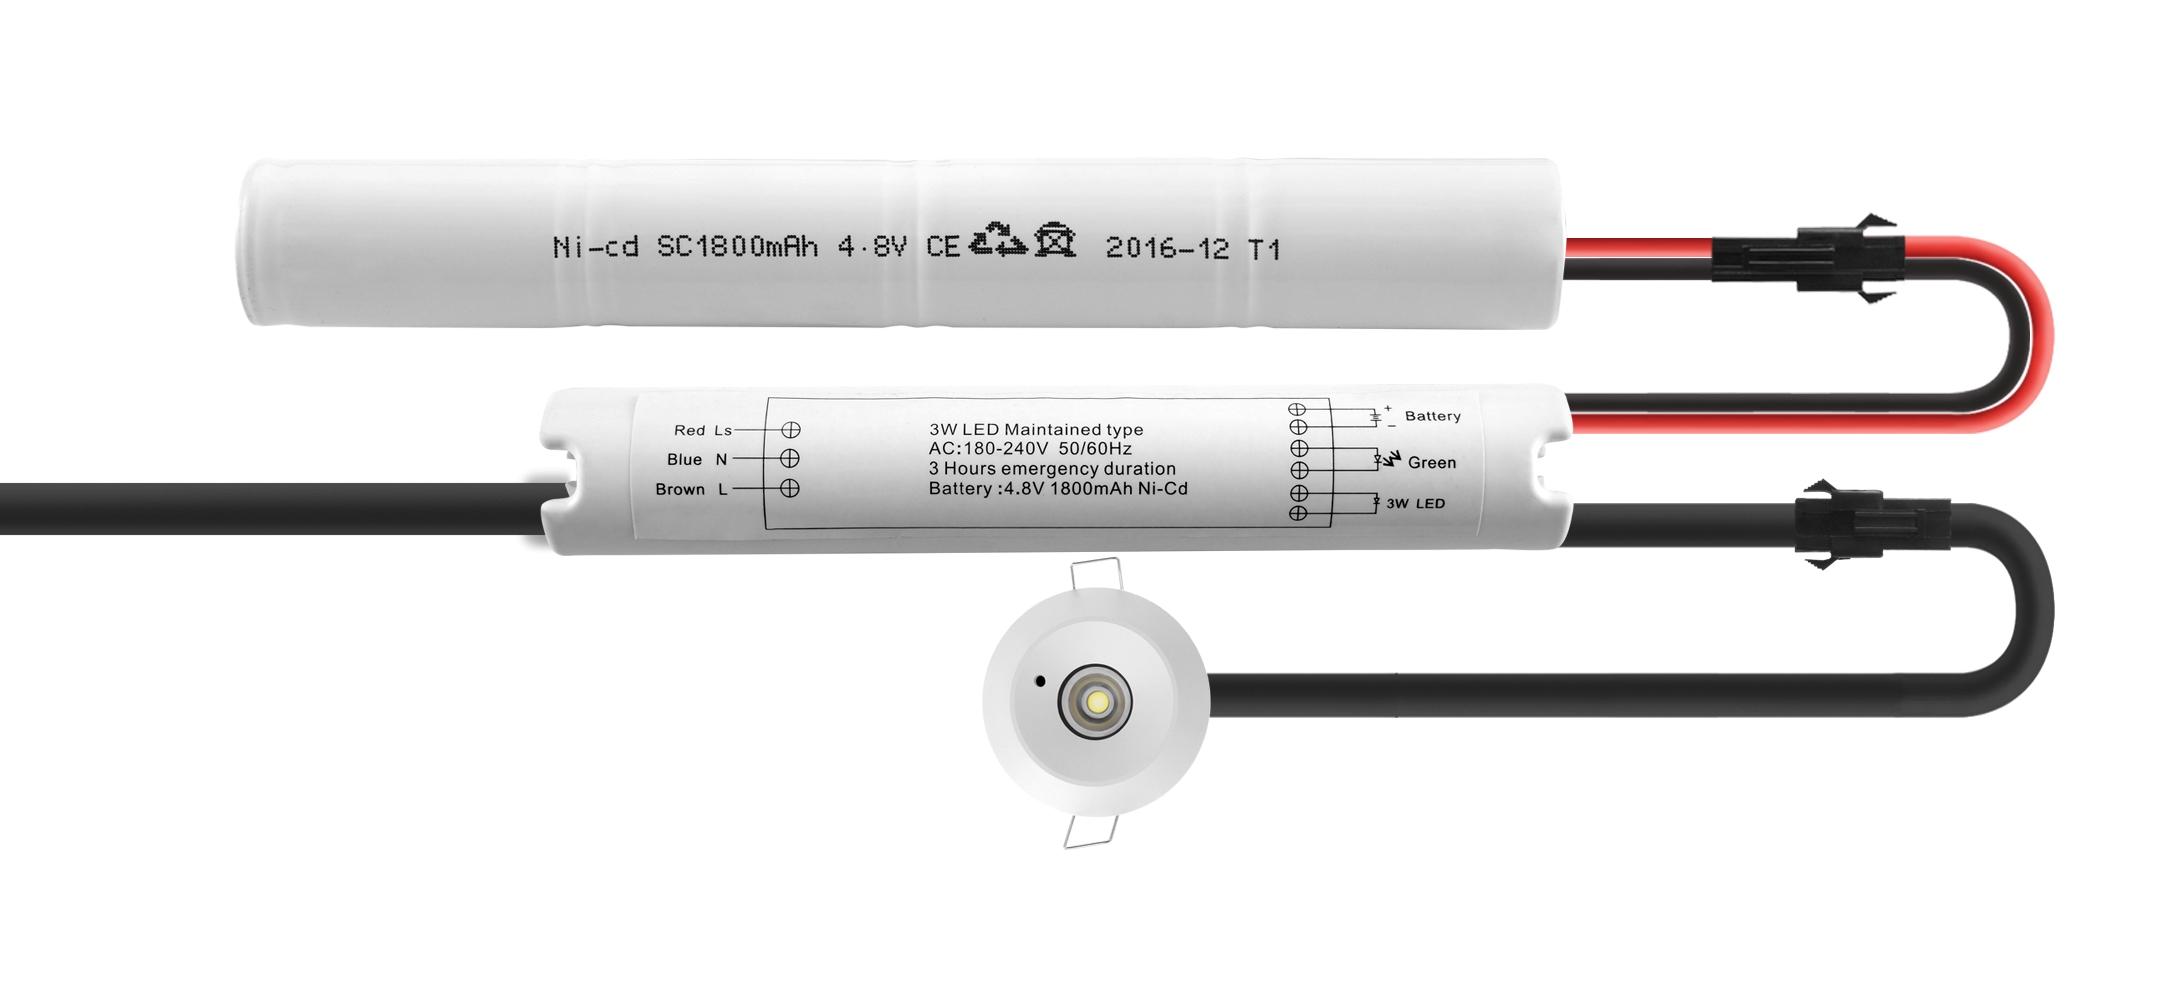 Senska noodverlichting SR-2120 Image